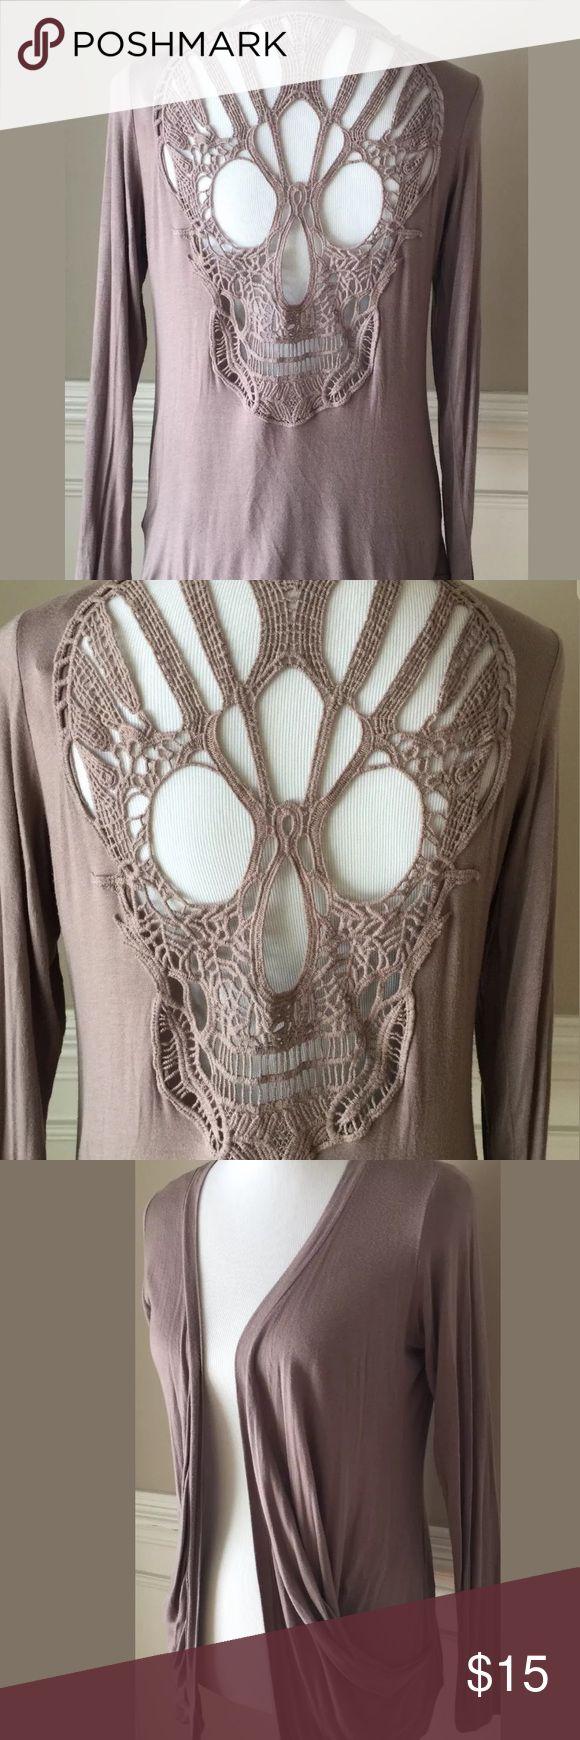 Zinga Skull Crochet Open Front Cardigan Size S Zinga Women Thin Knit Open Front Cardigan Skull Design On Back pockets Size S zinga Sweaters